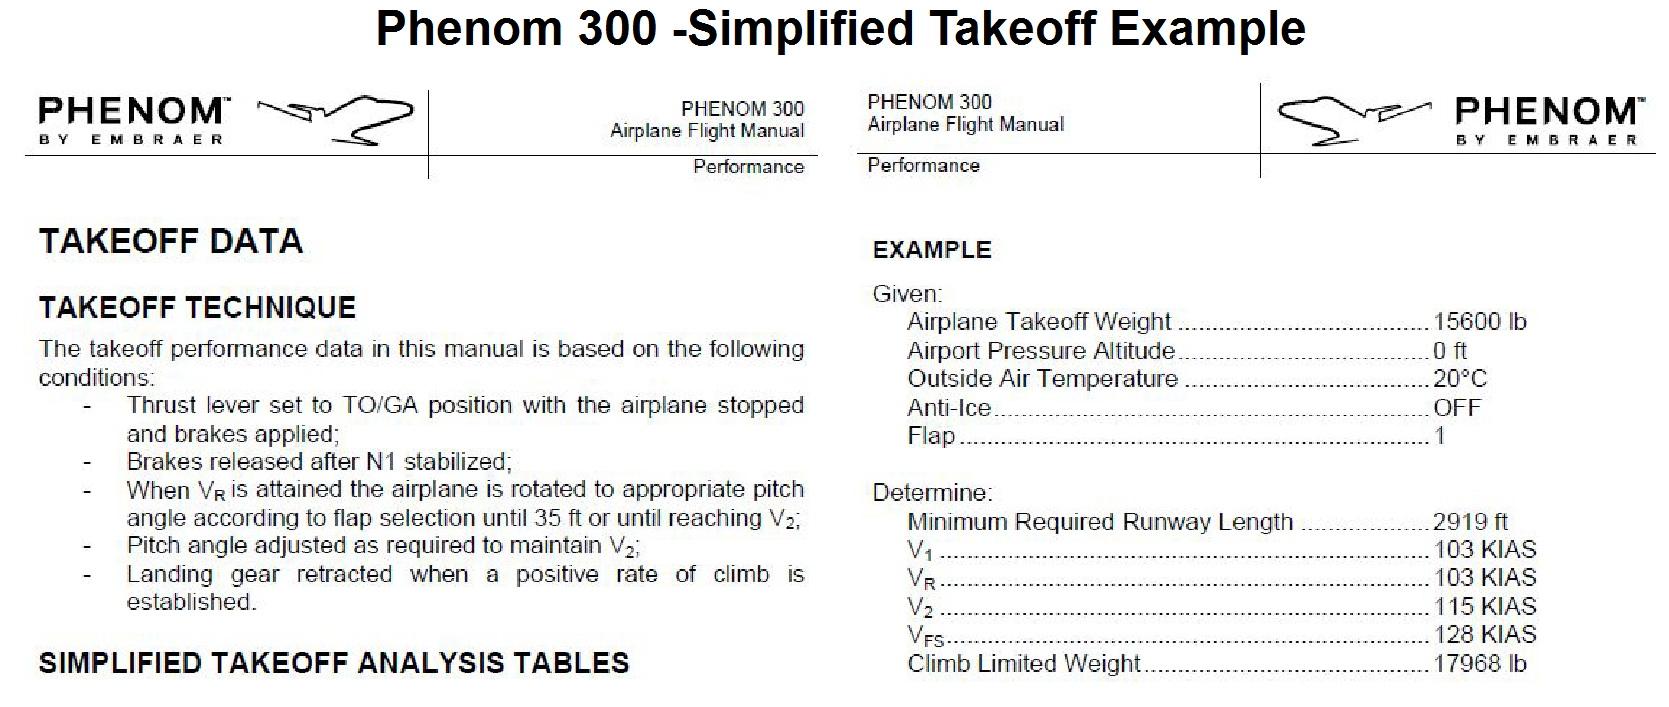 98 Takeoff example.jpg